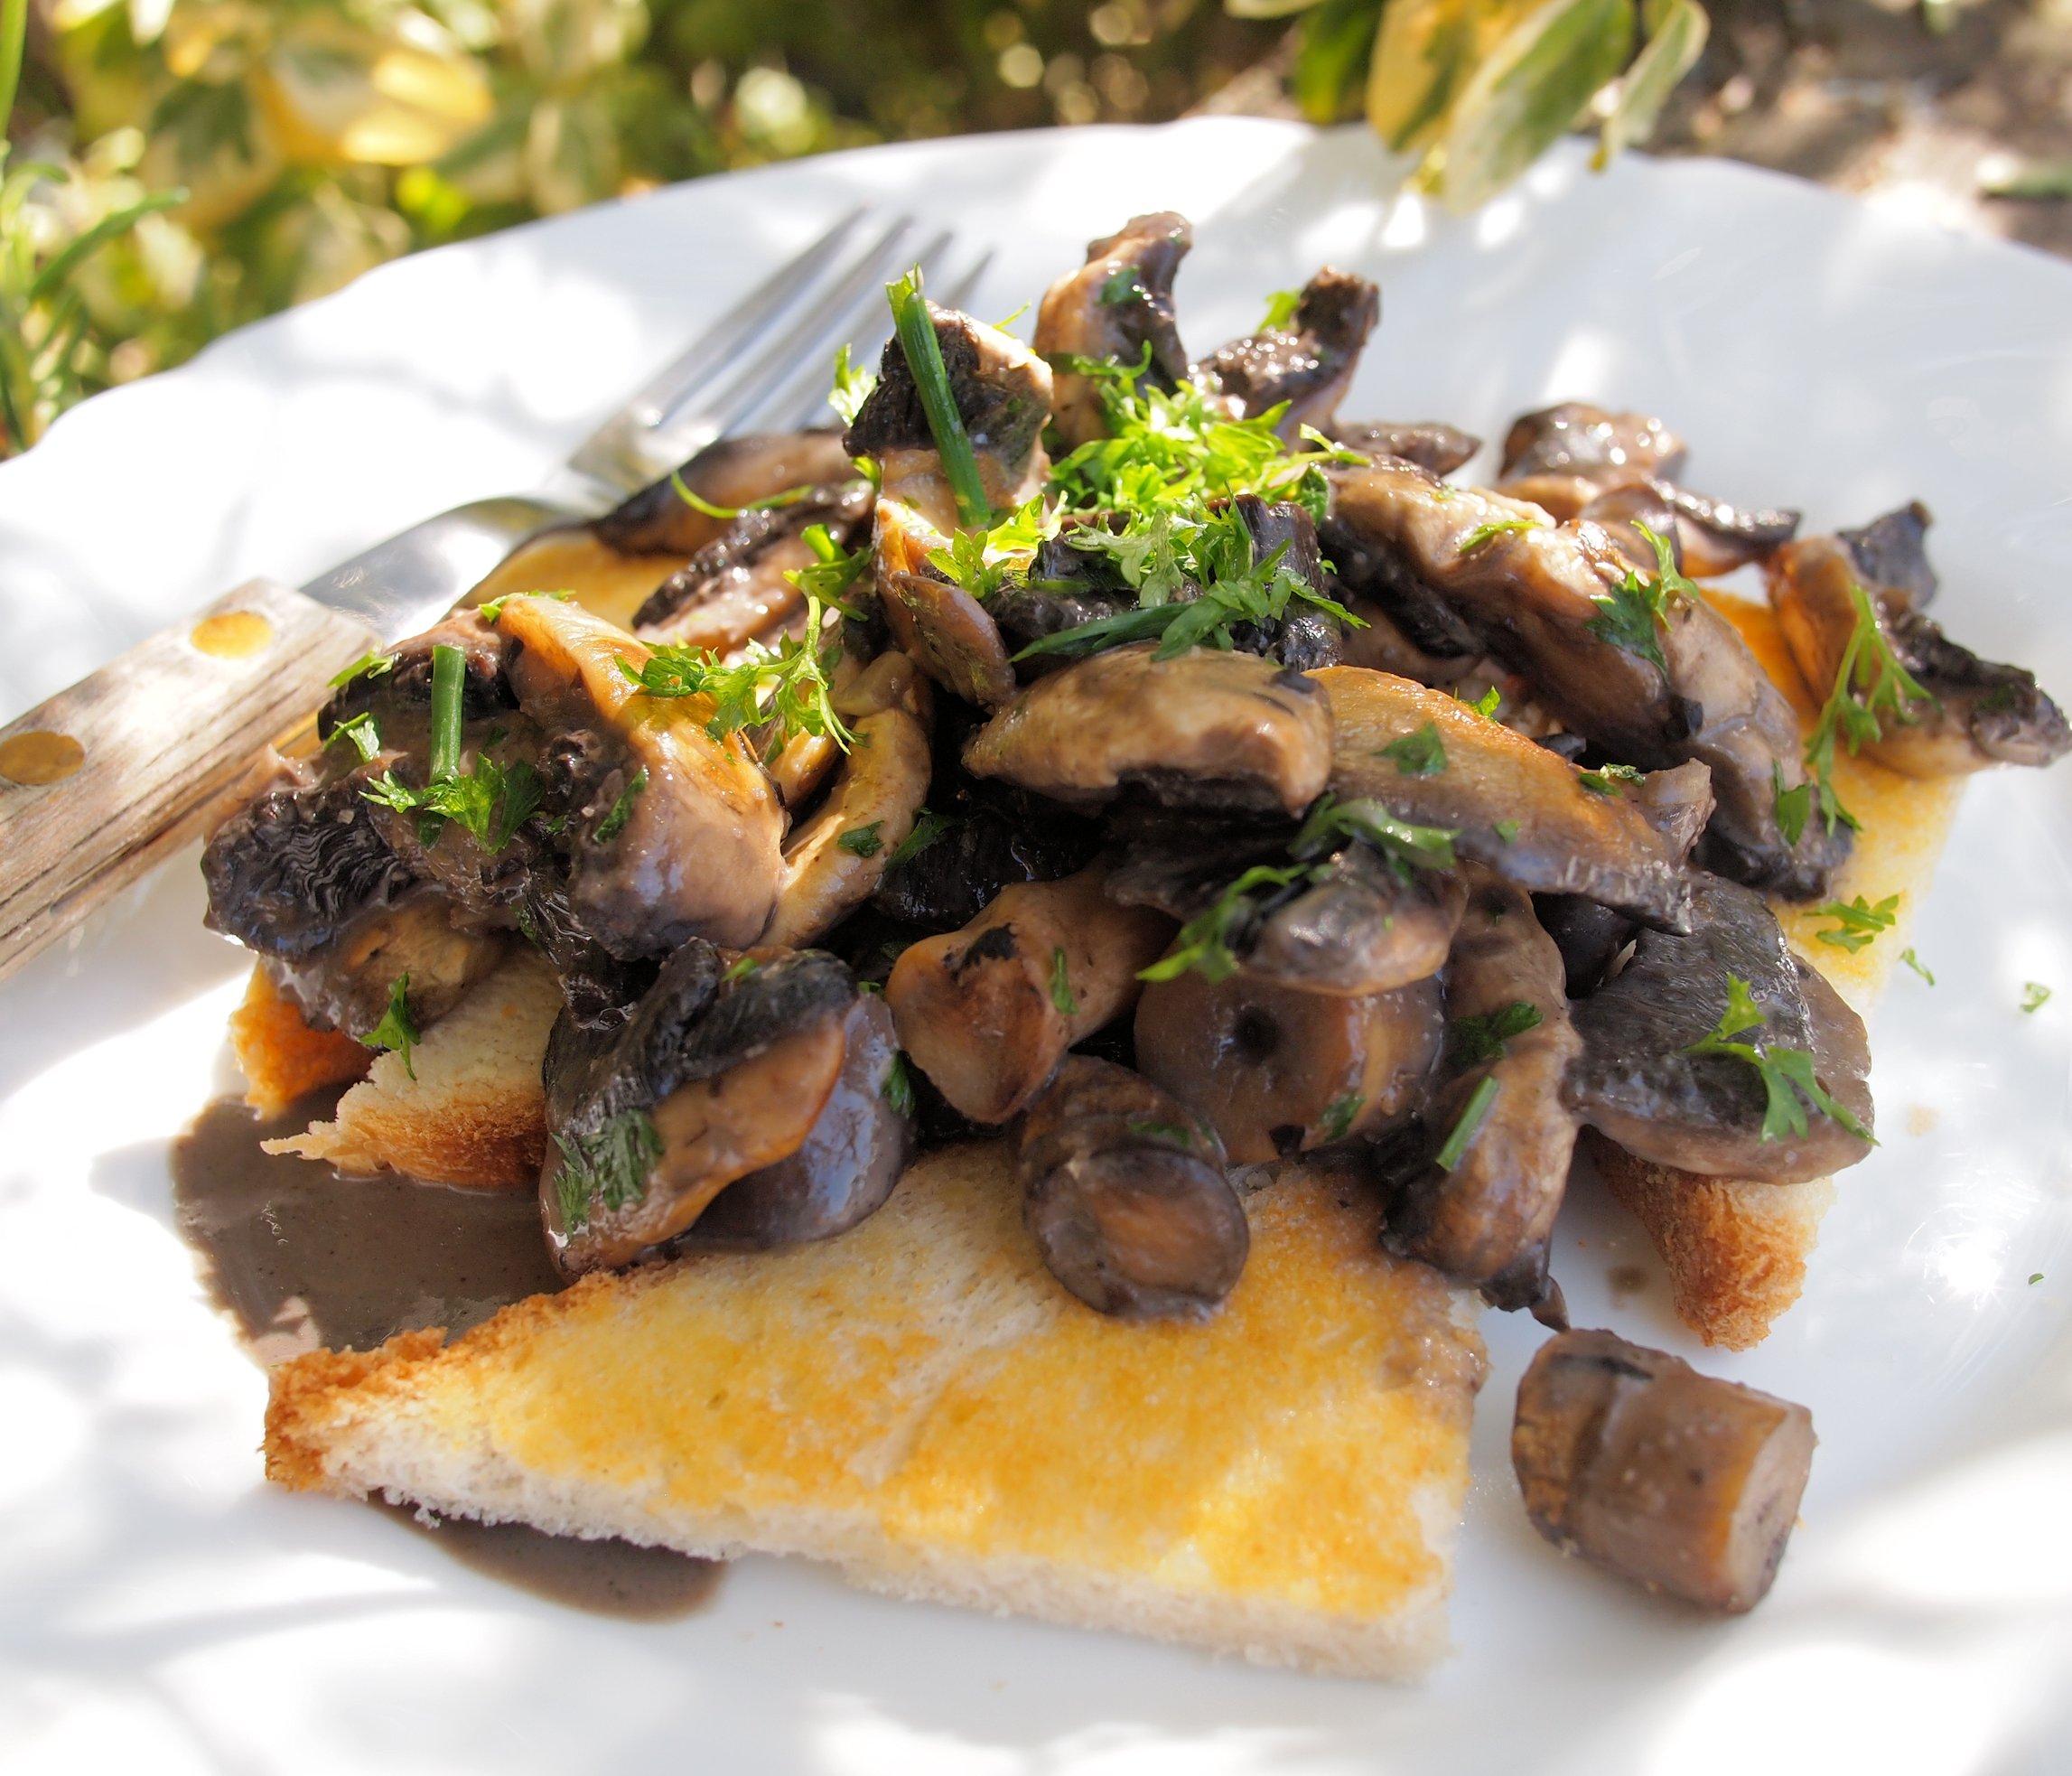 Creamy Garlic Mushrooms on Toast